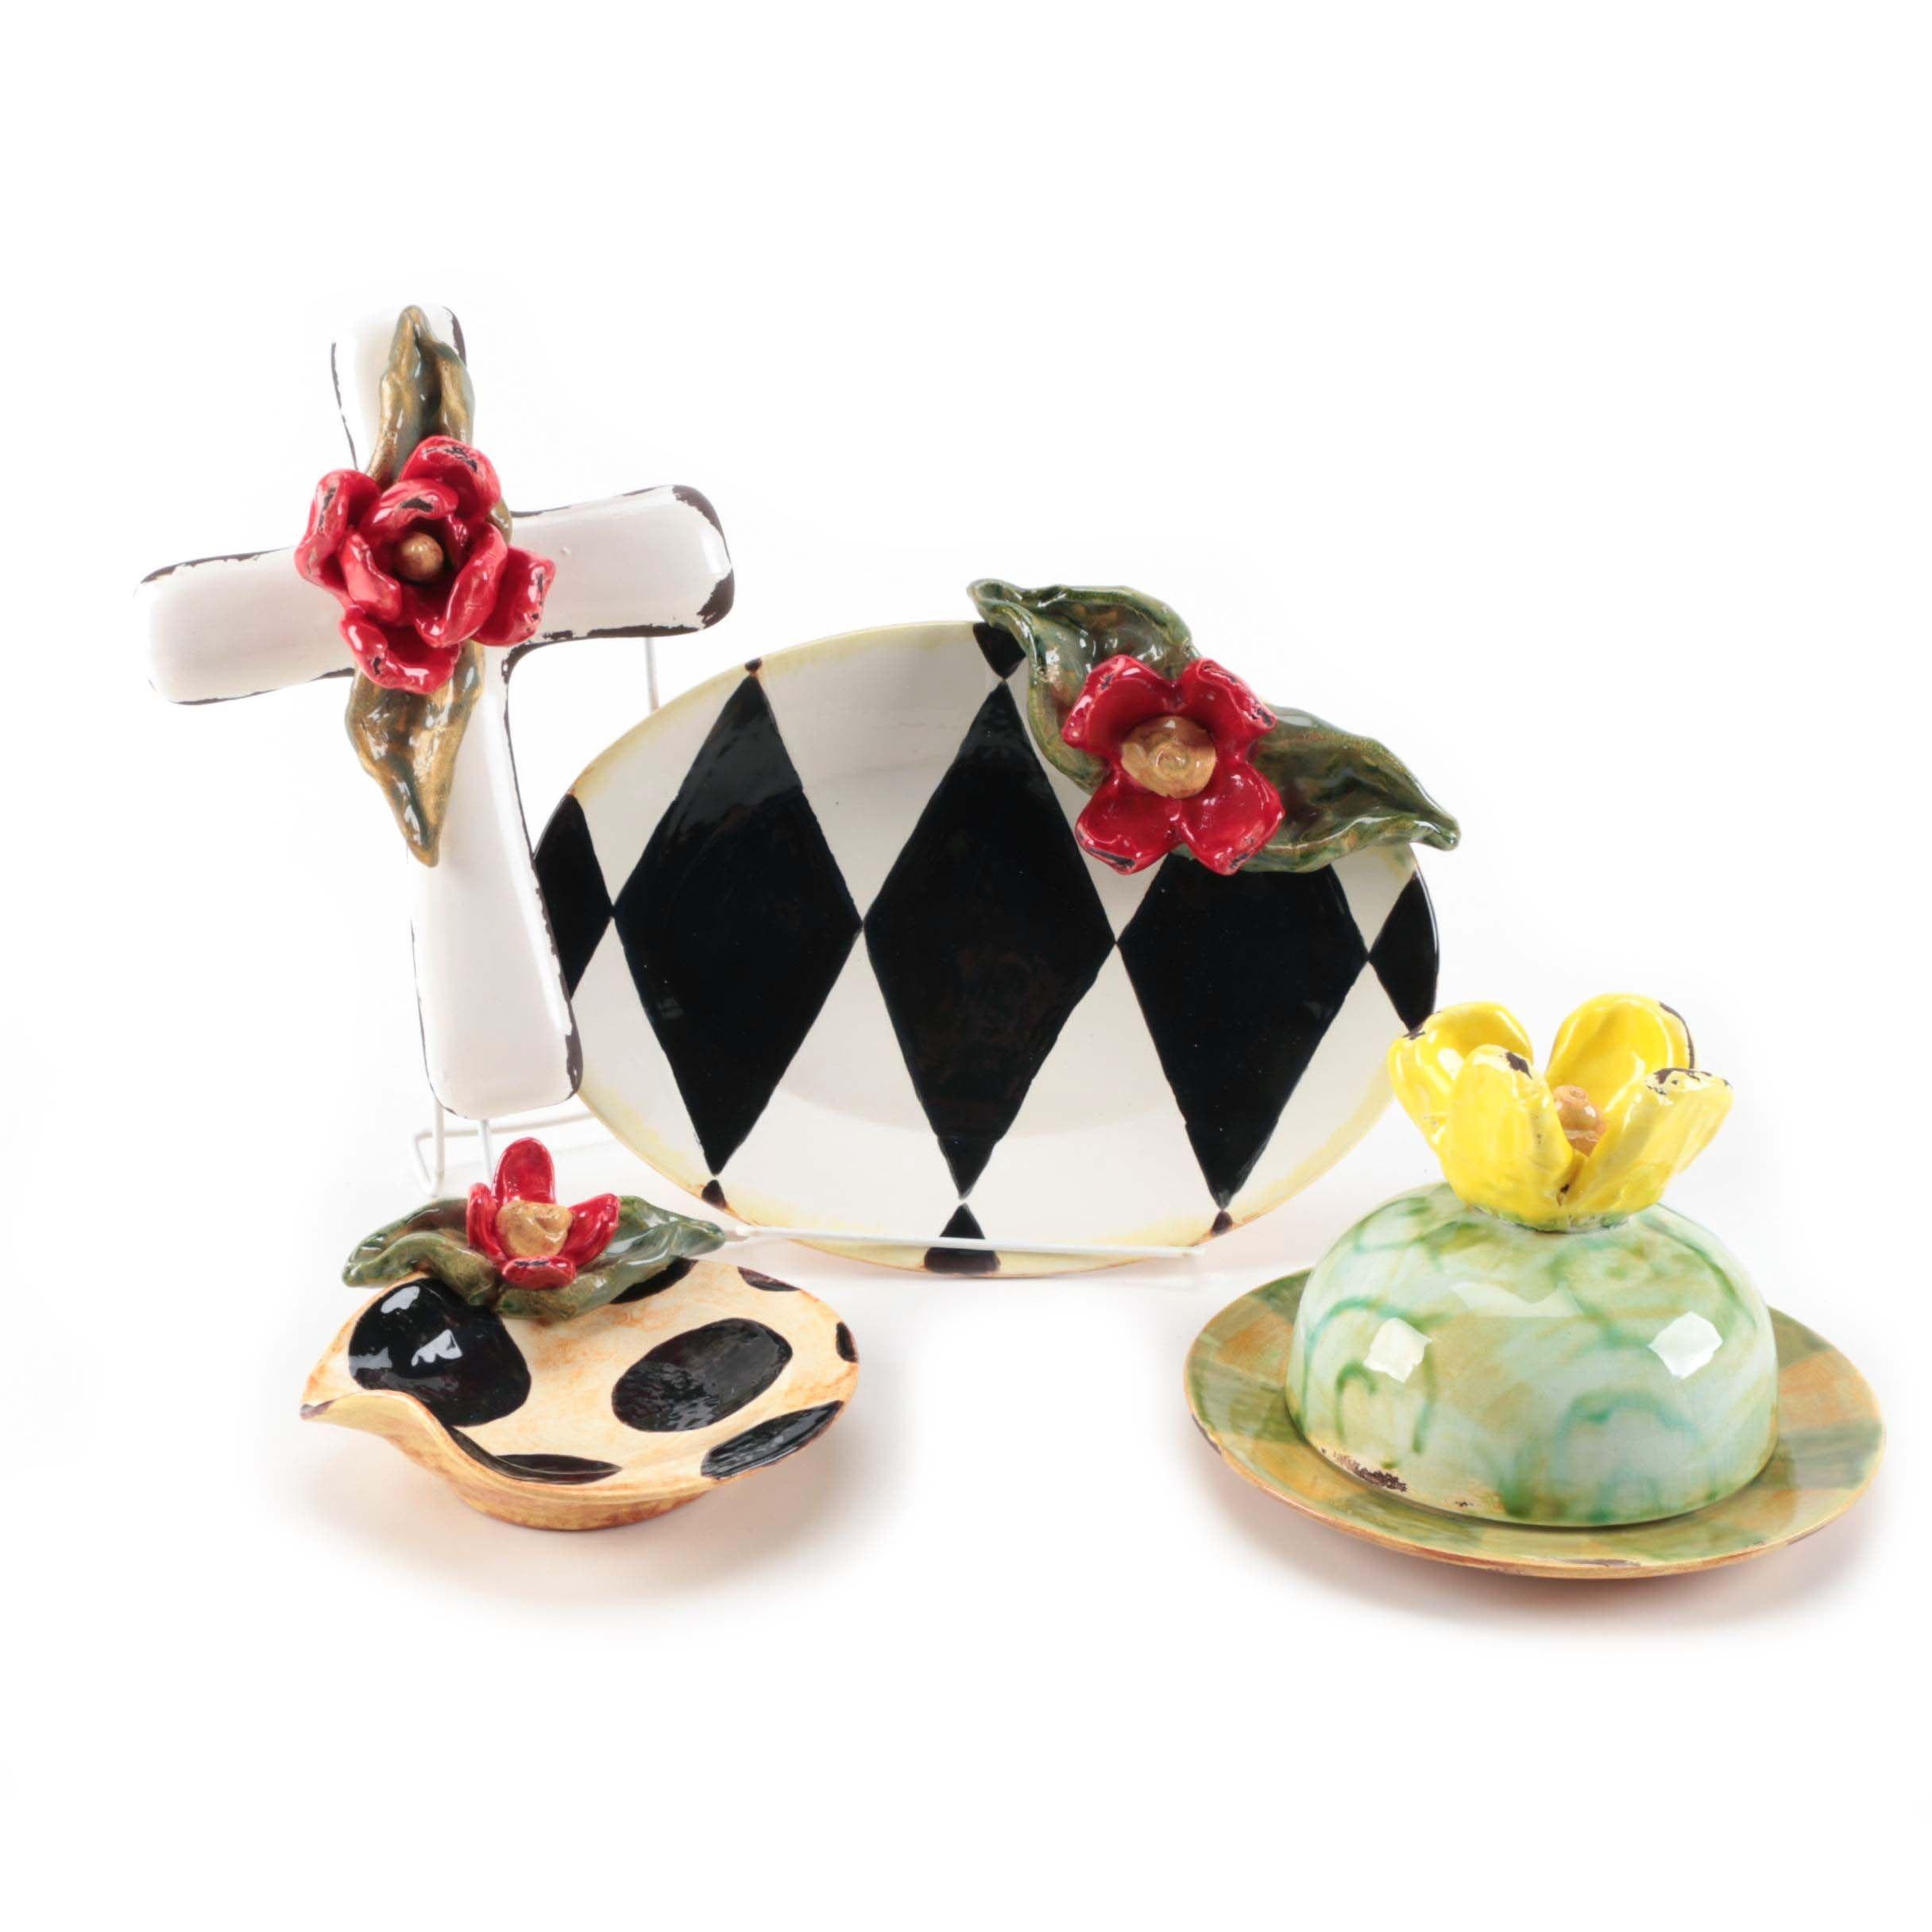 Collection of Ceramic Decor